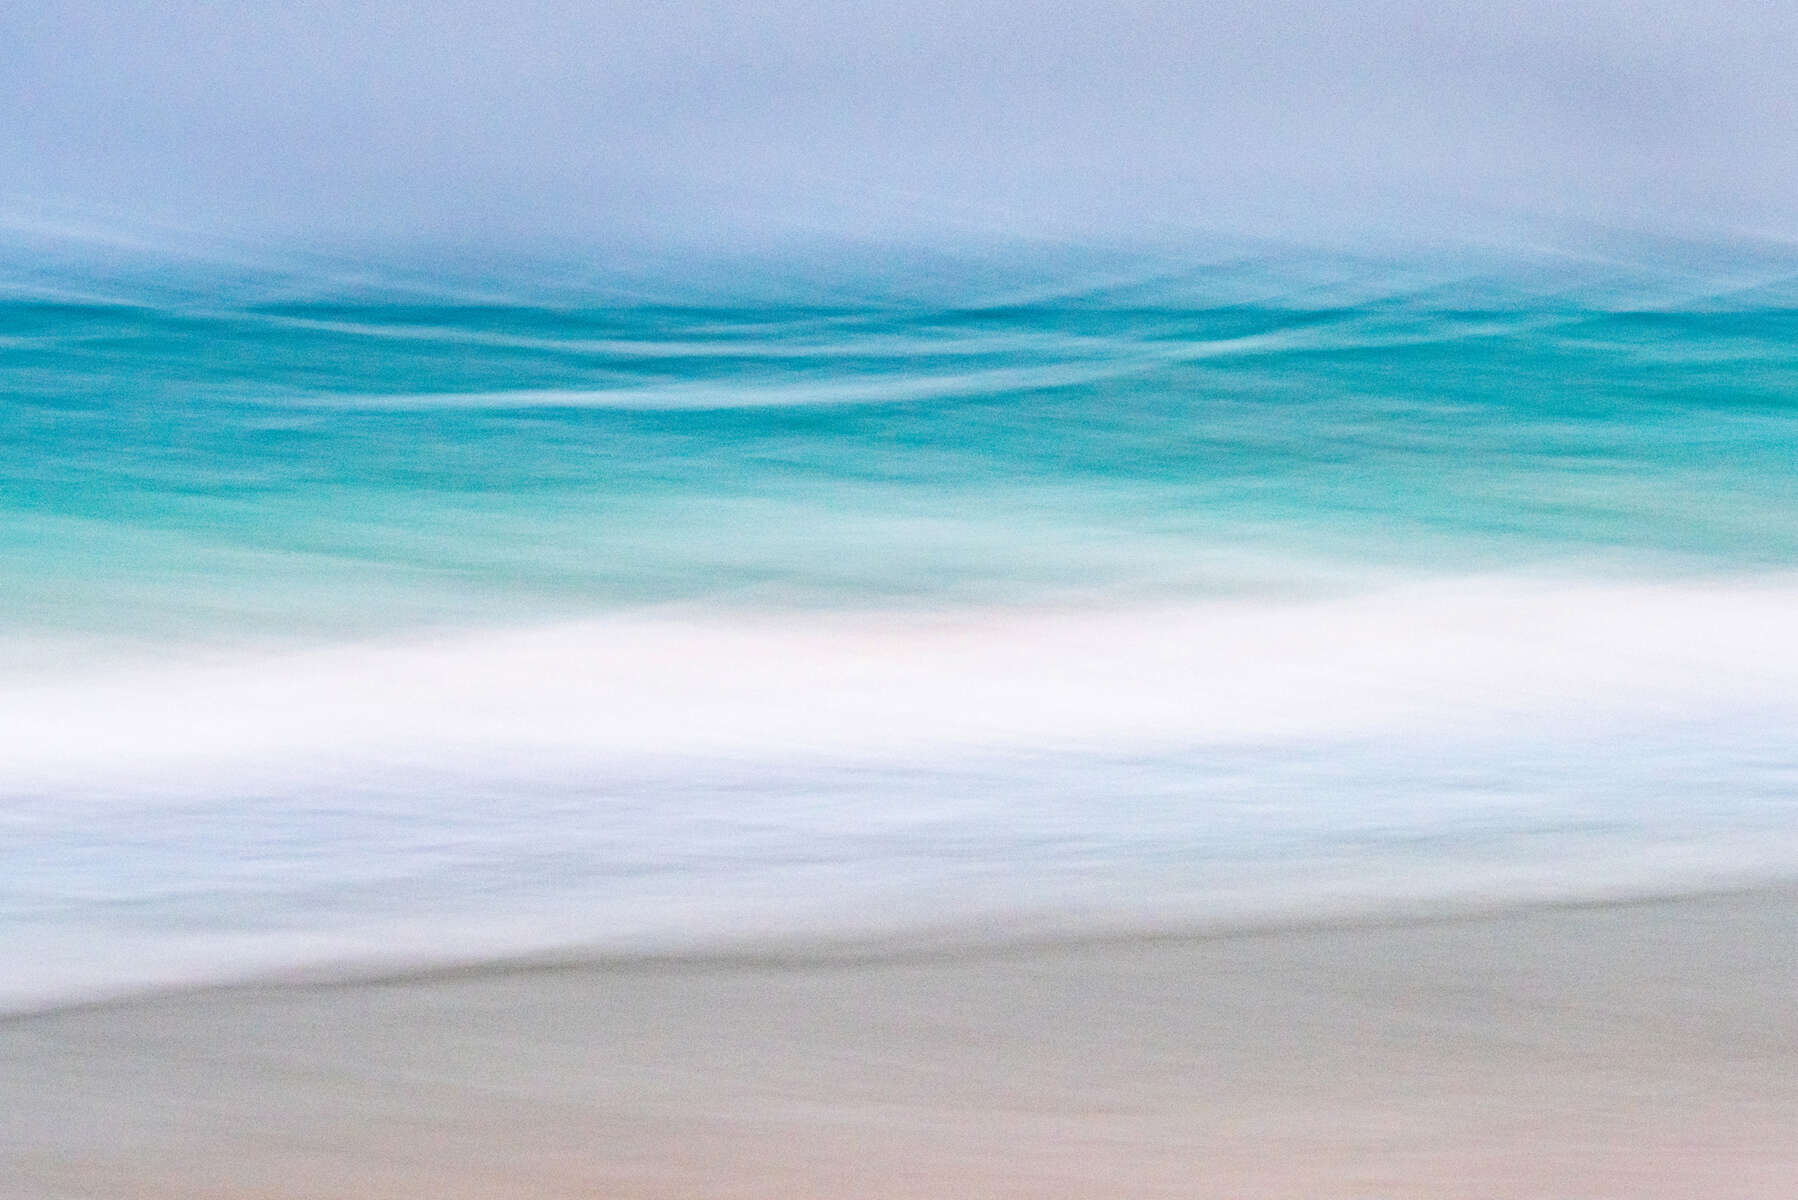 Tropical Sea Abstract